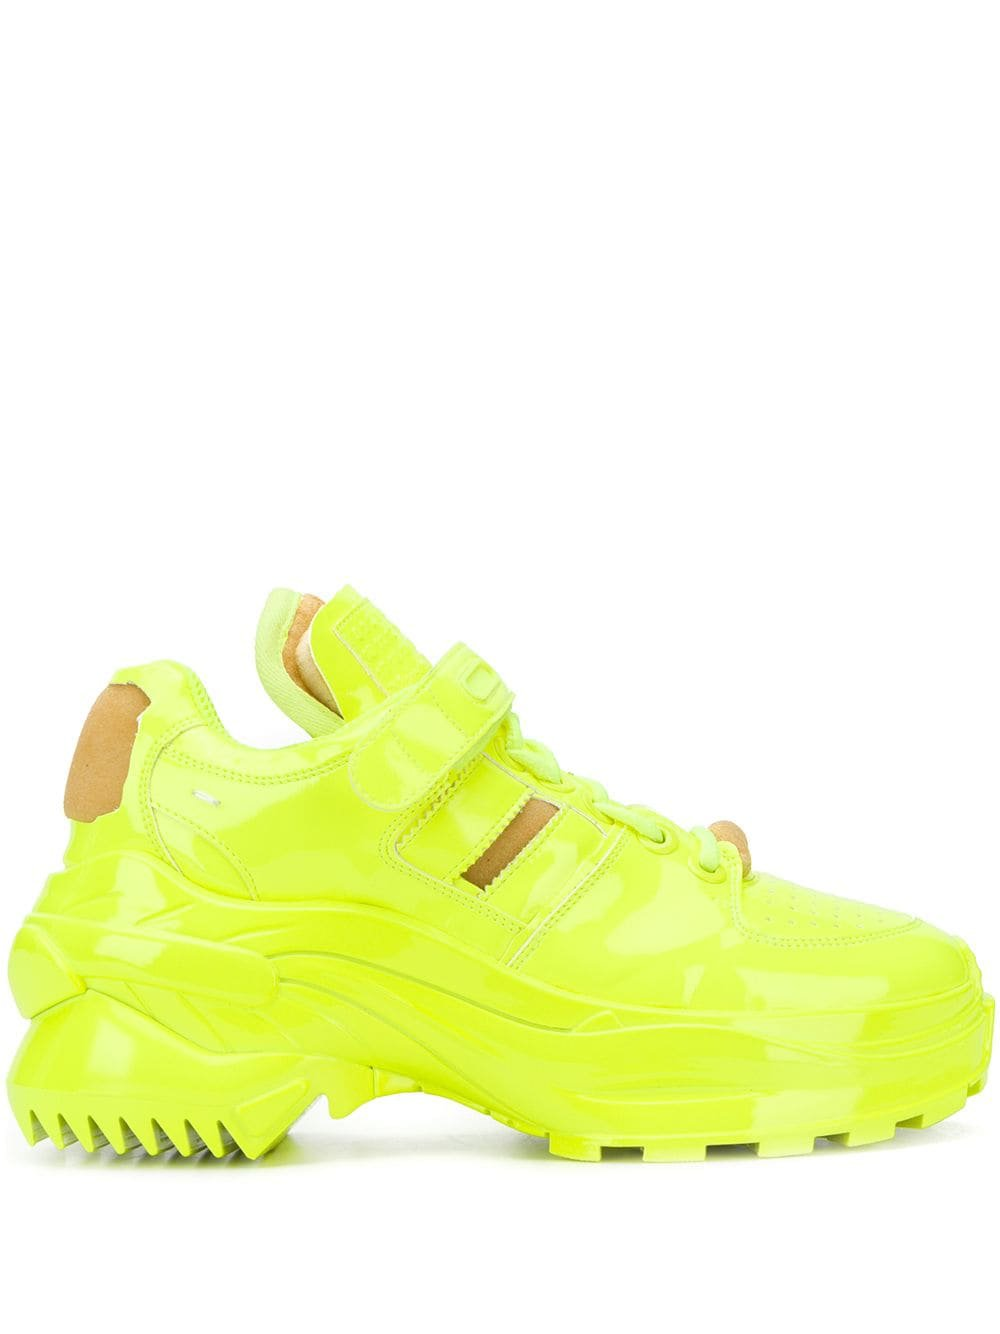 Maison Margiela Retro Fit Chunky Sneakers